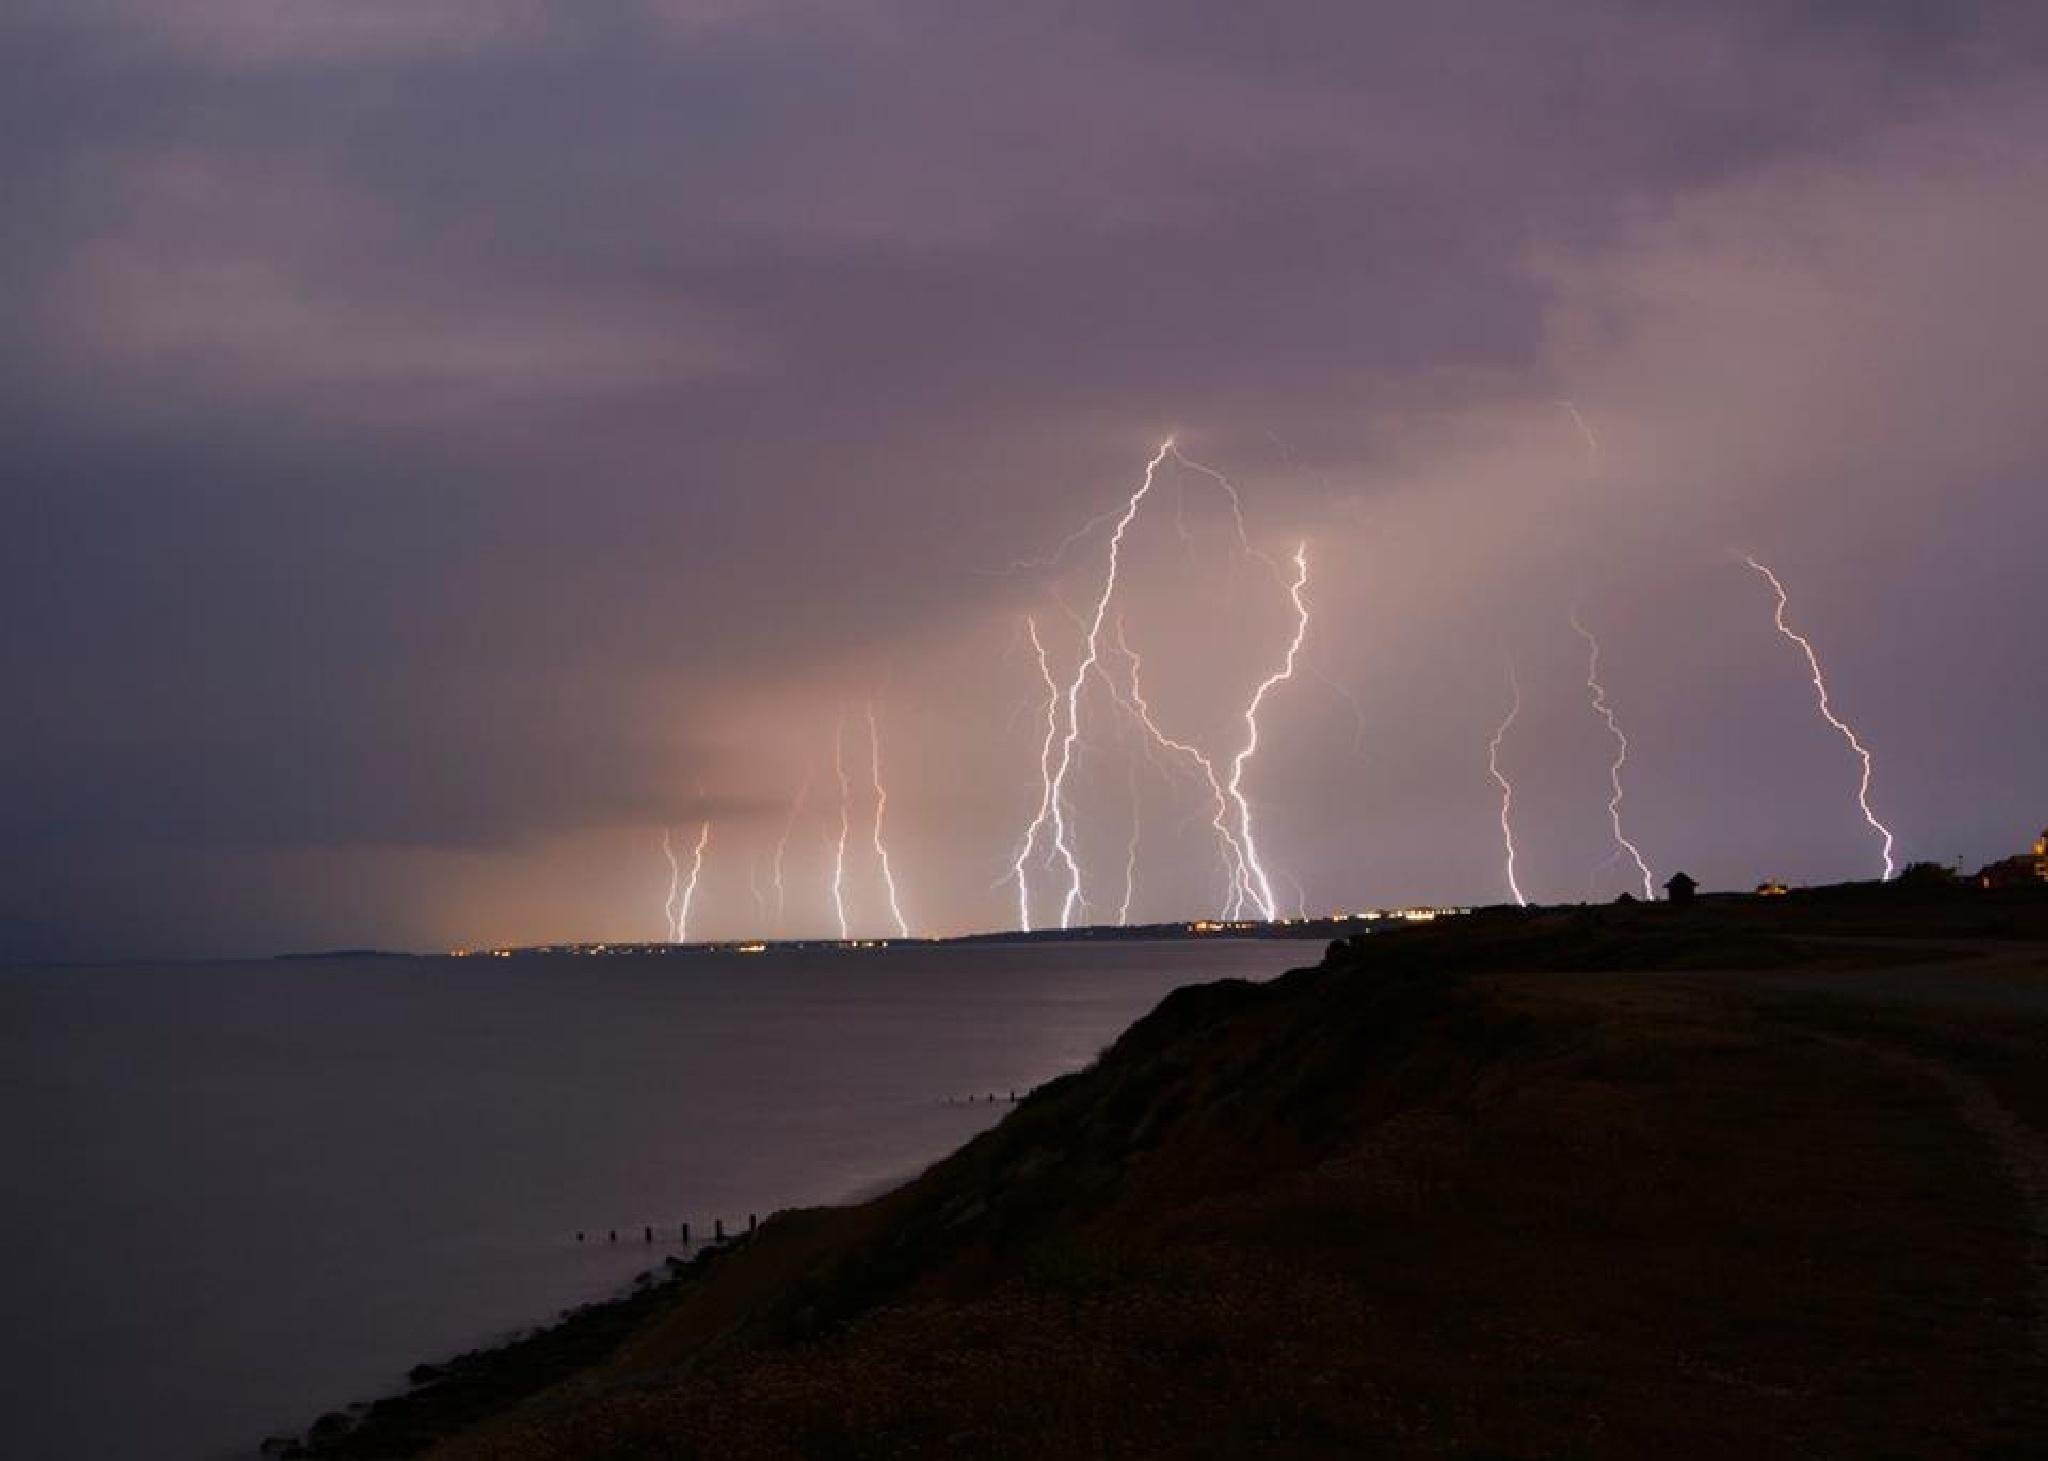 lightning strikes by stephen.roberts.31586